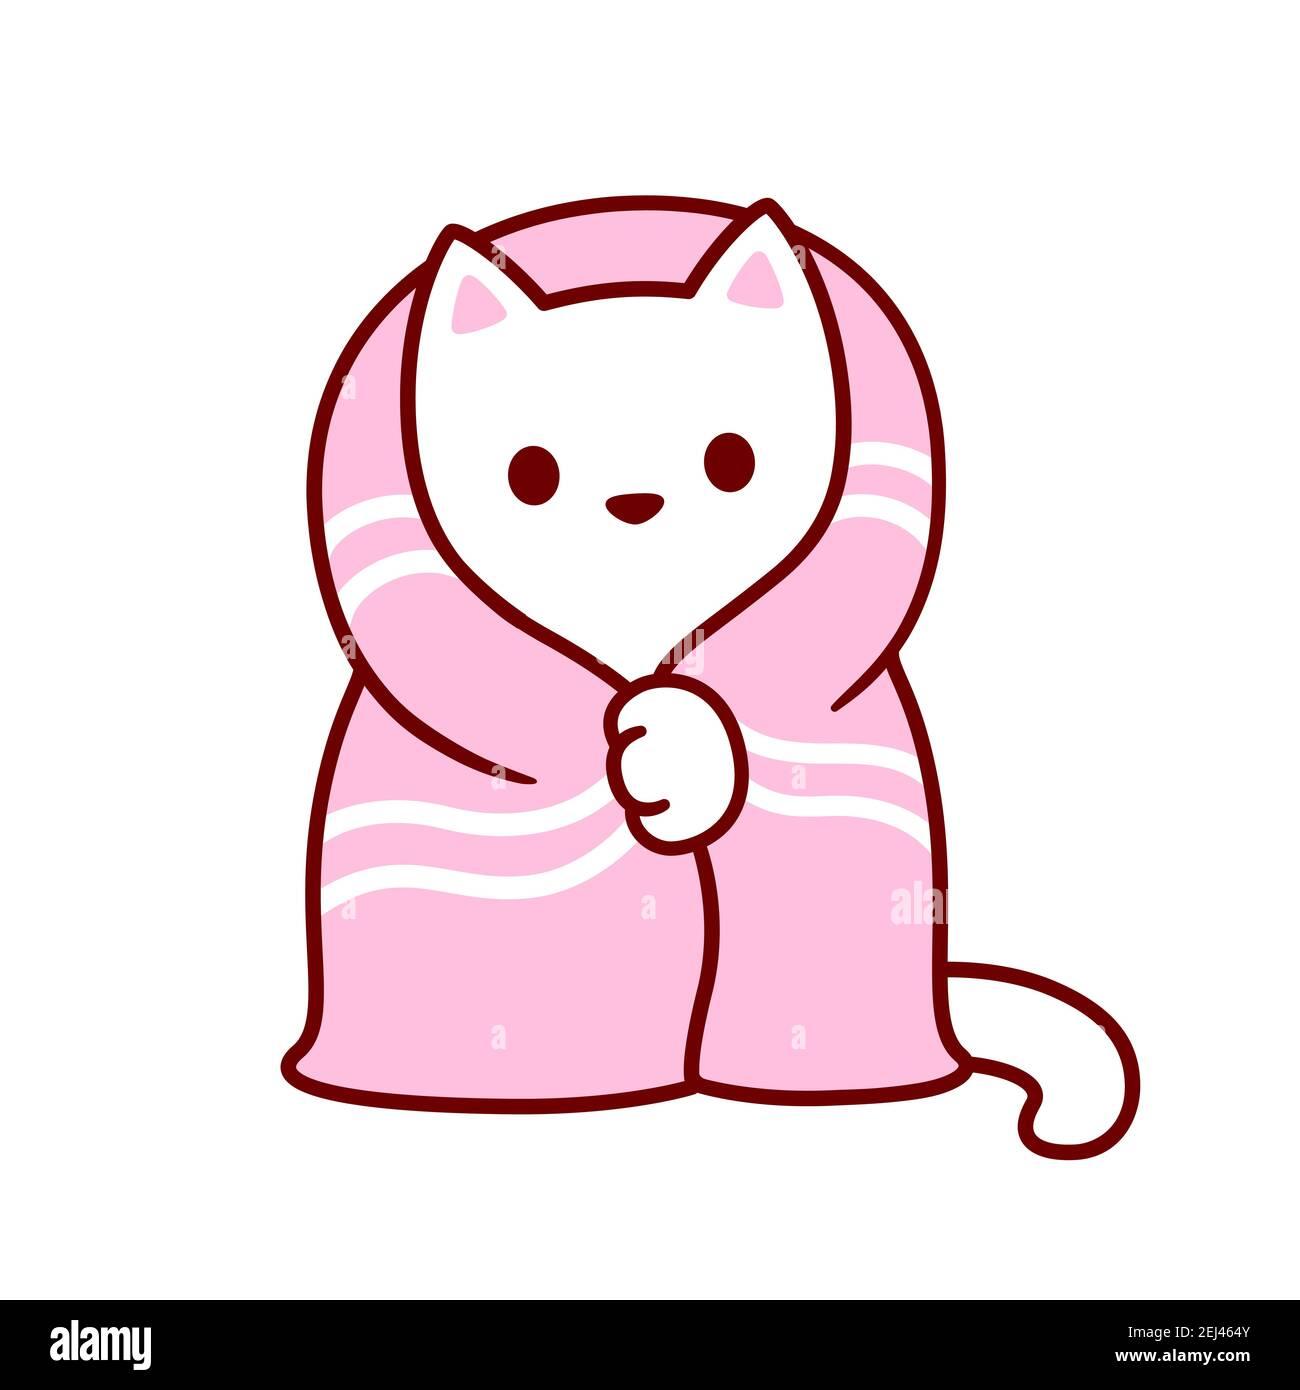 Kawaii Kitten Art High Resolution Stock Photography And Images Alamy